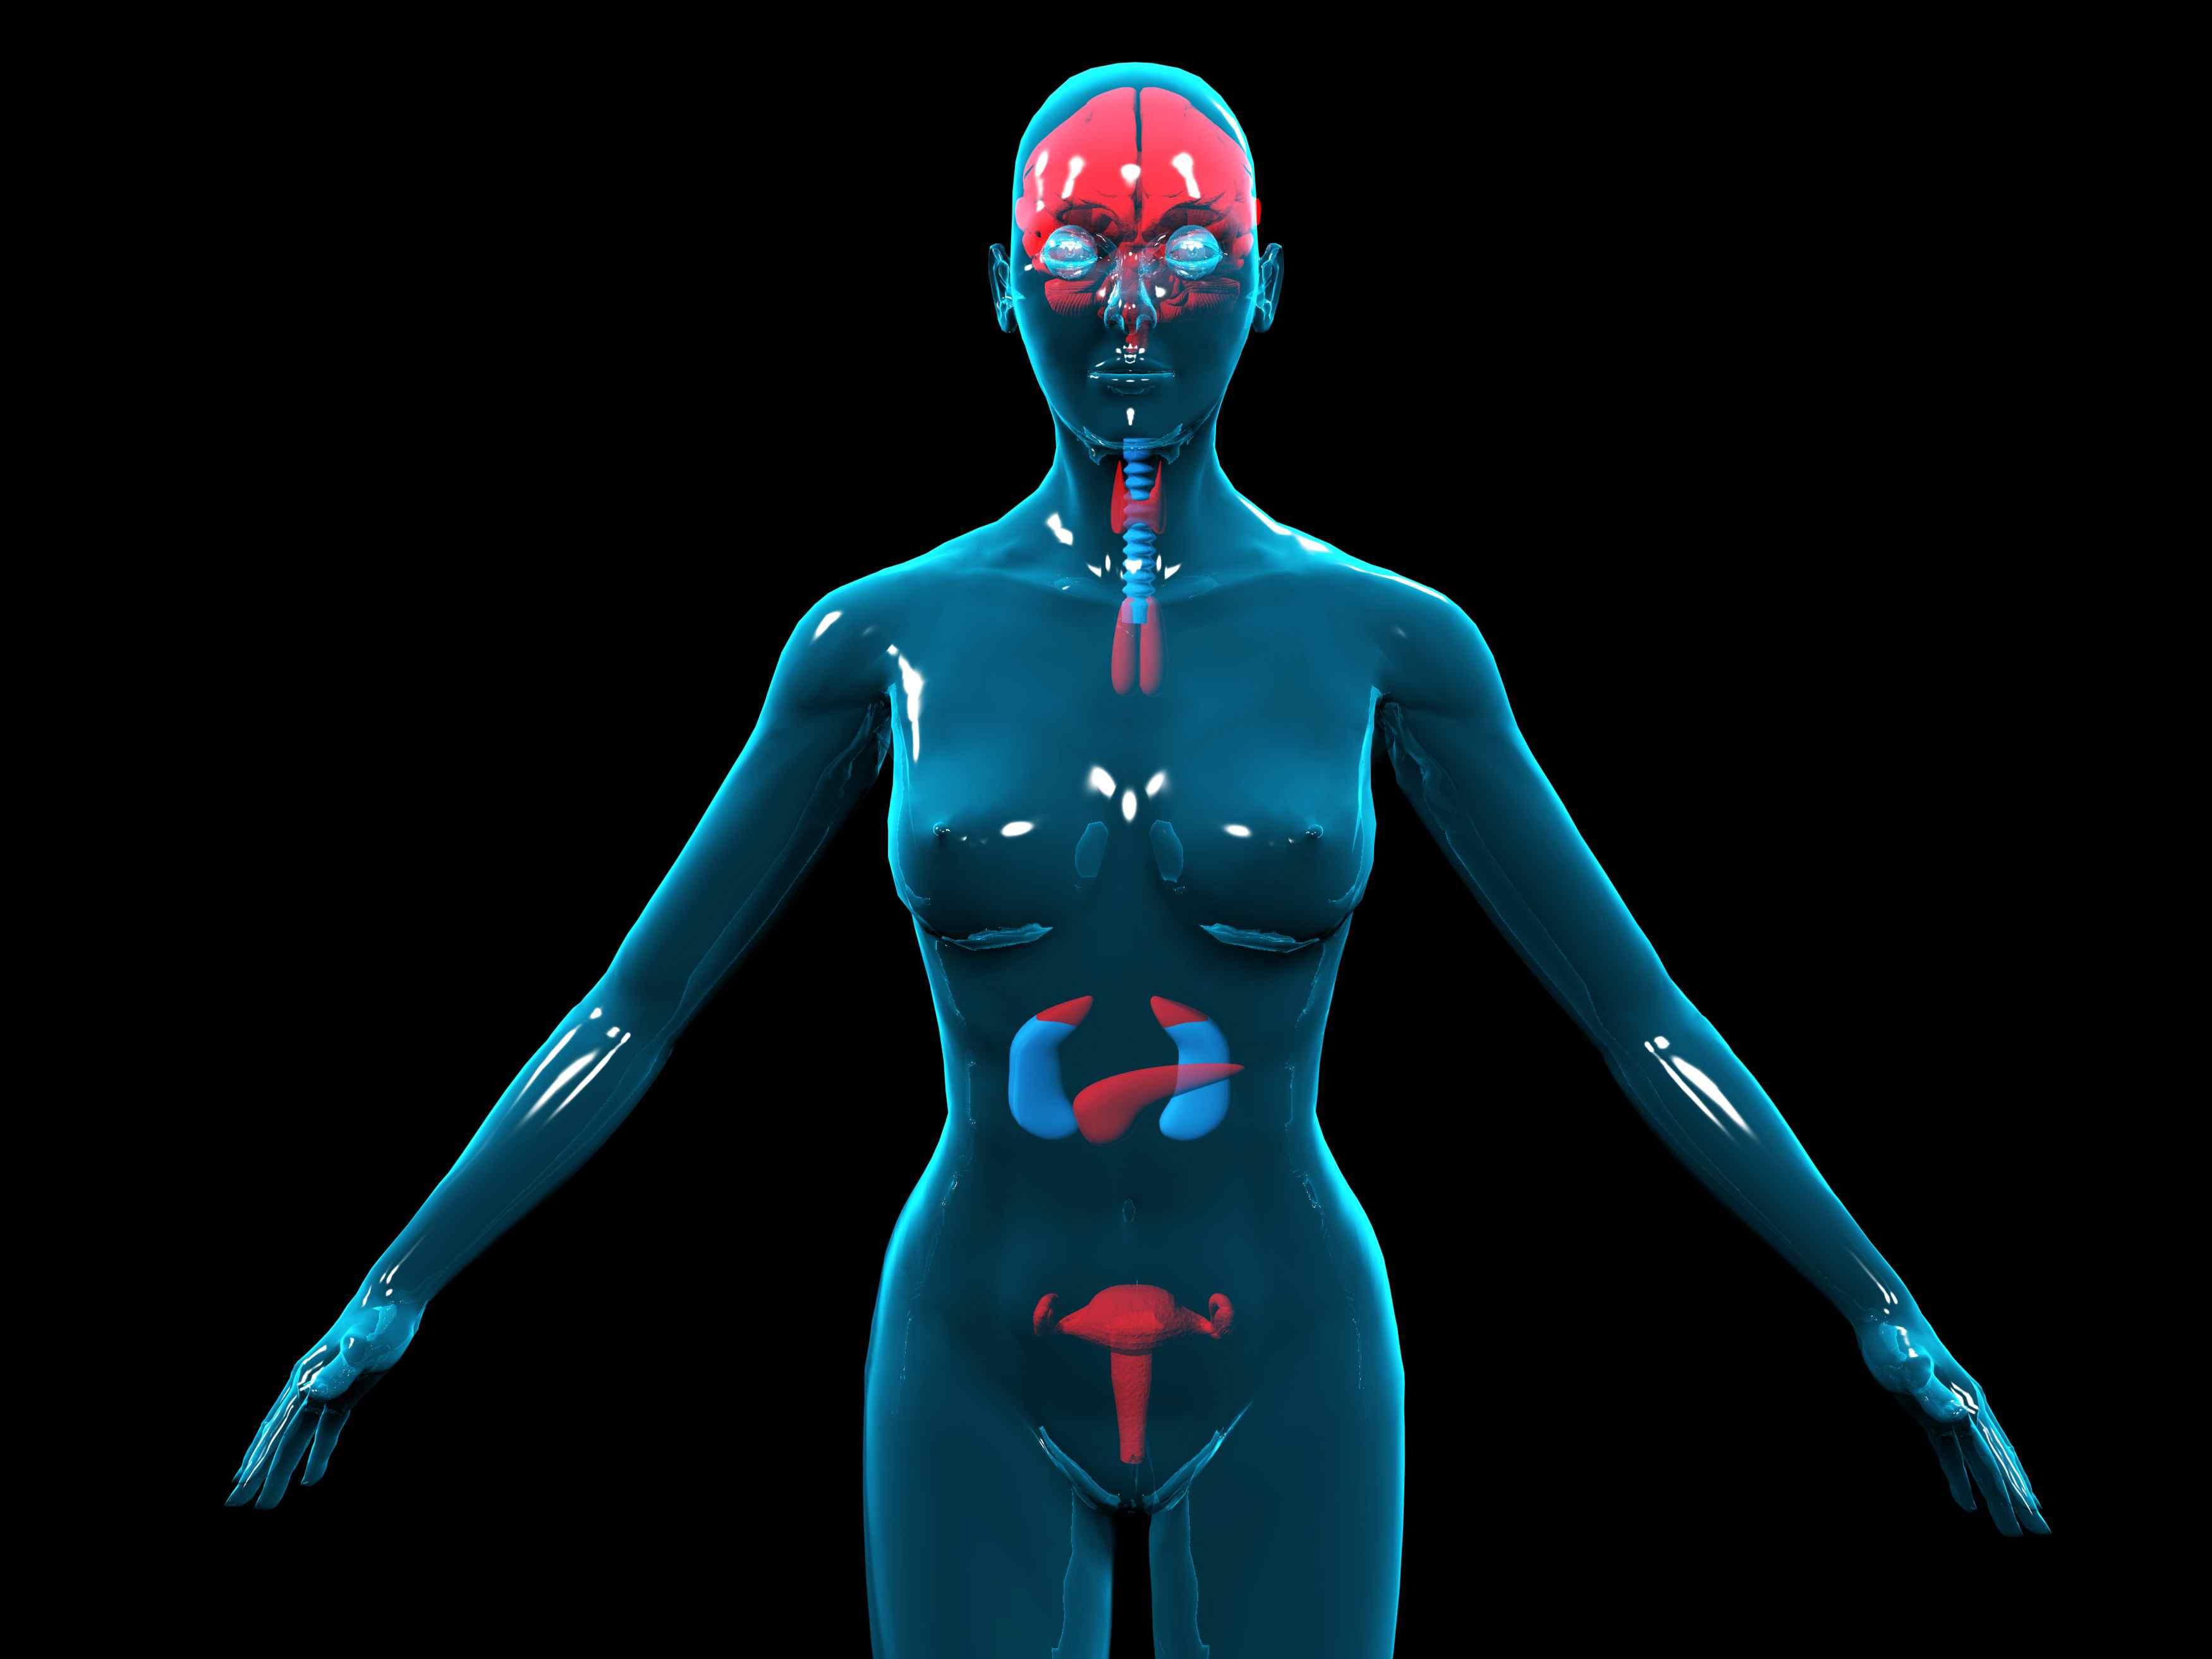 3D illustration of the female hormone/endocrine system